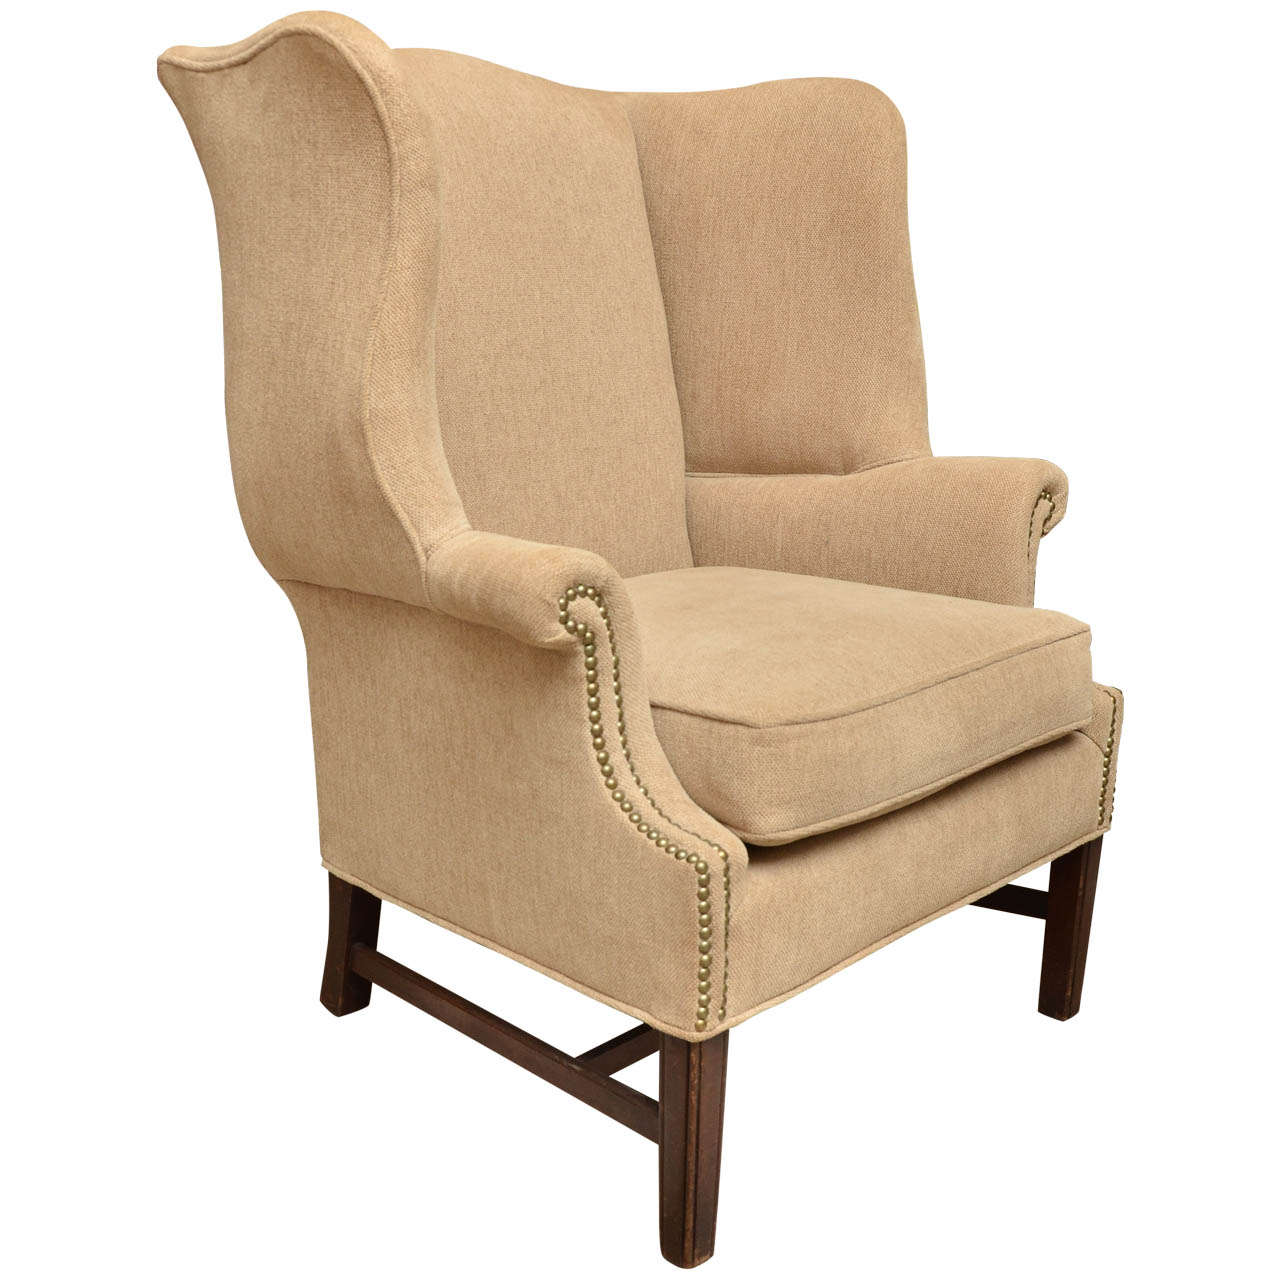 Seating Mini Gravita Armchair In Oriental Garden Fabric: English Georgian Style Mahogany Wing Chair